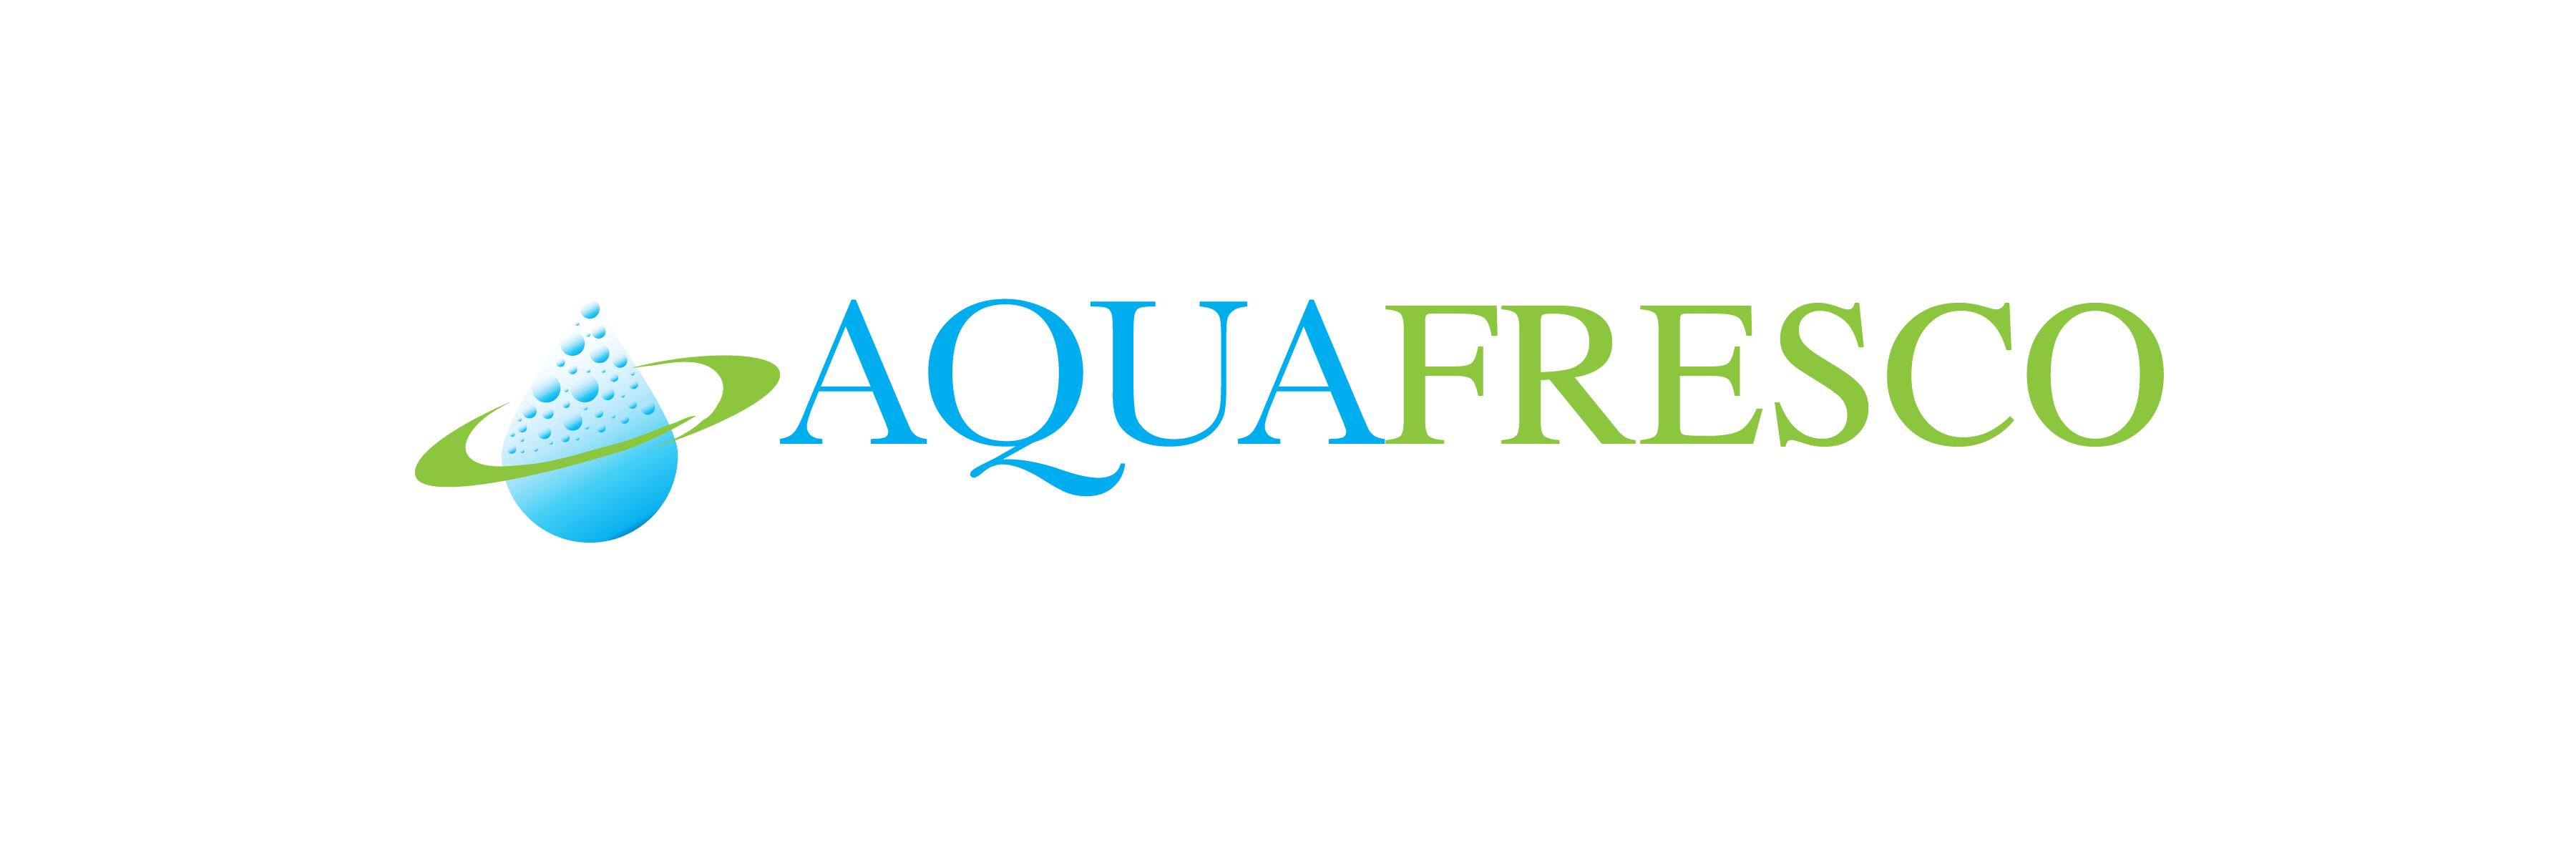 AquaFresco company logo